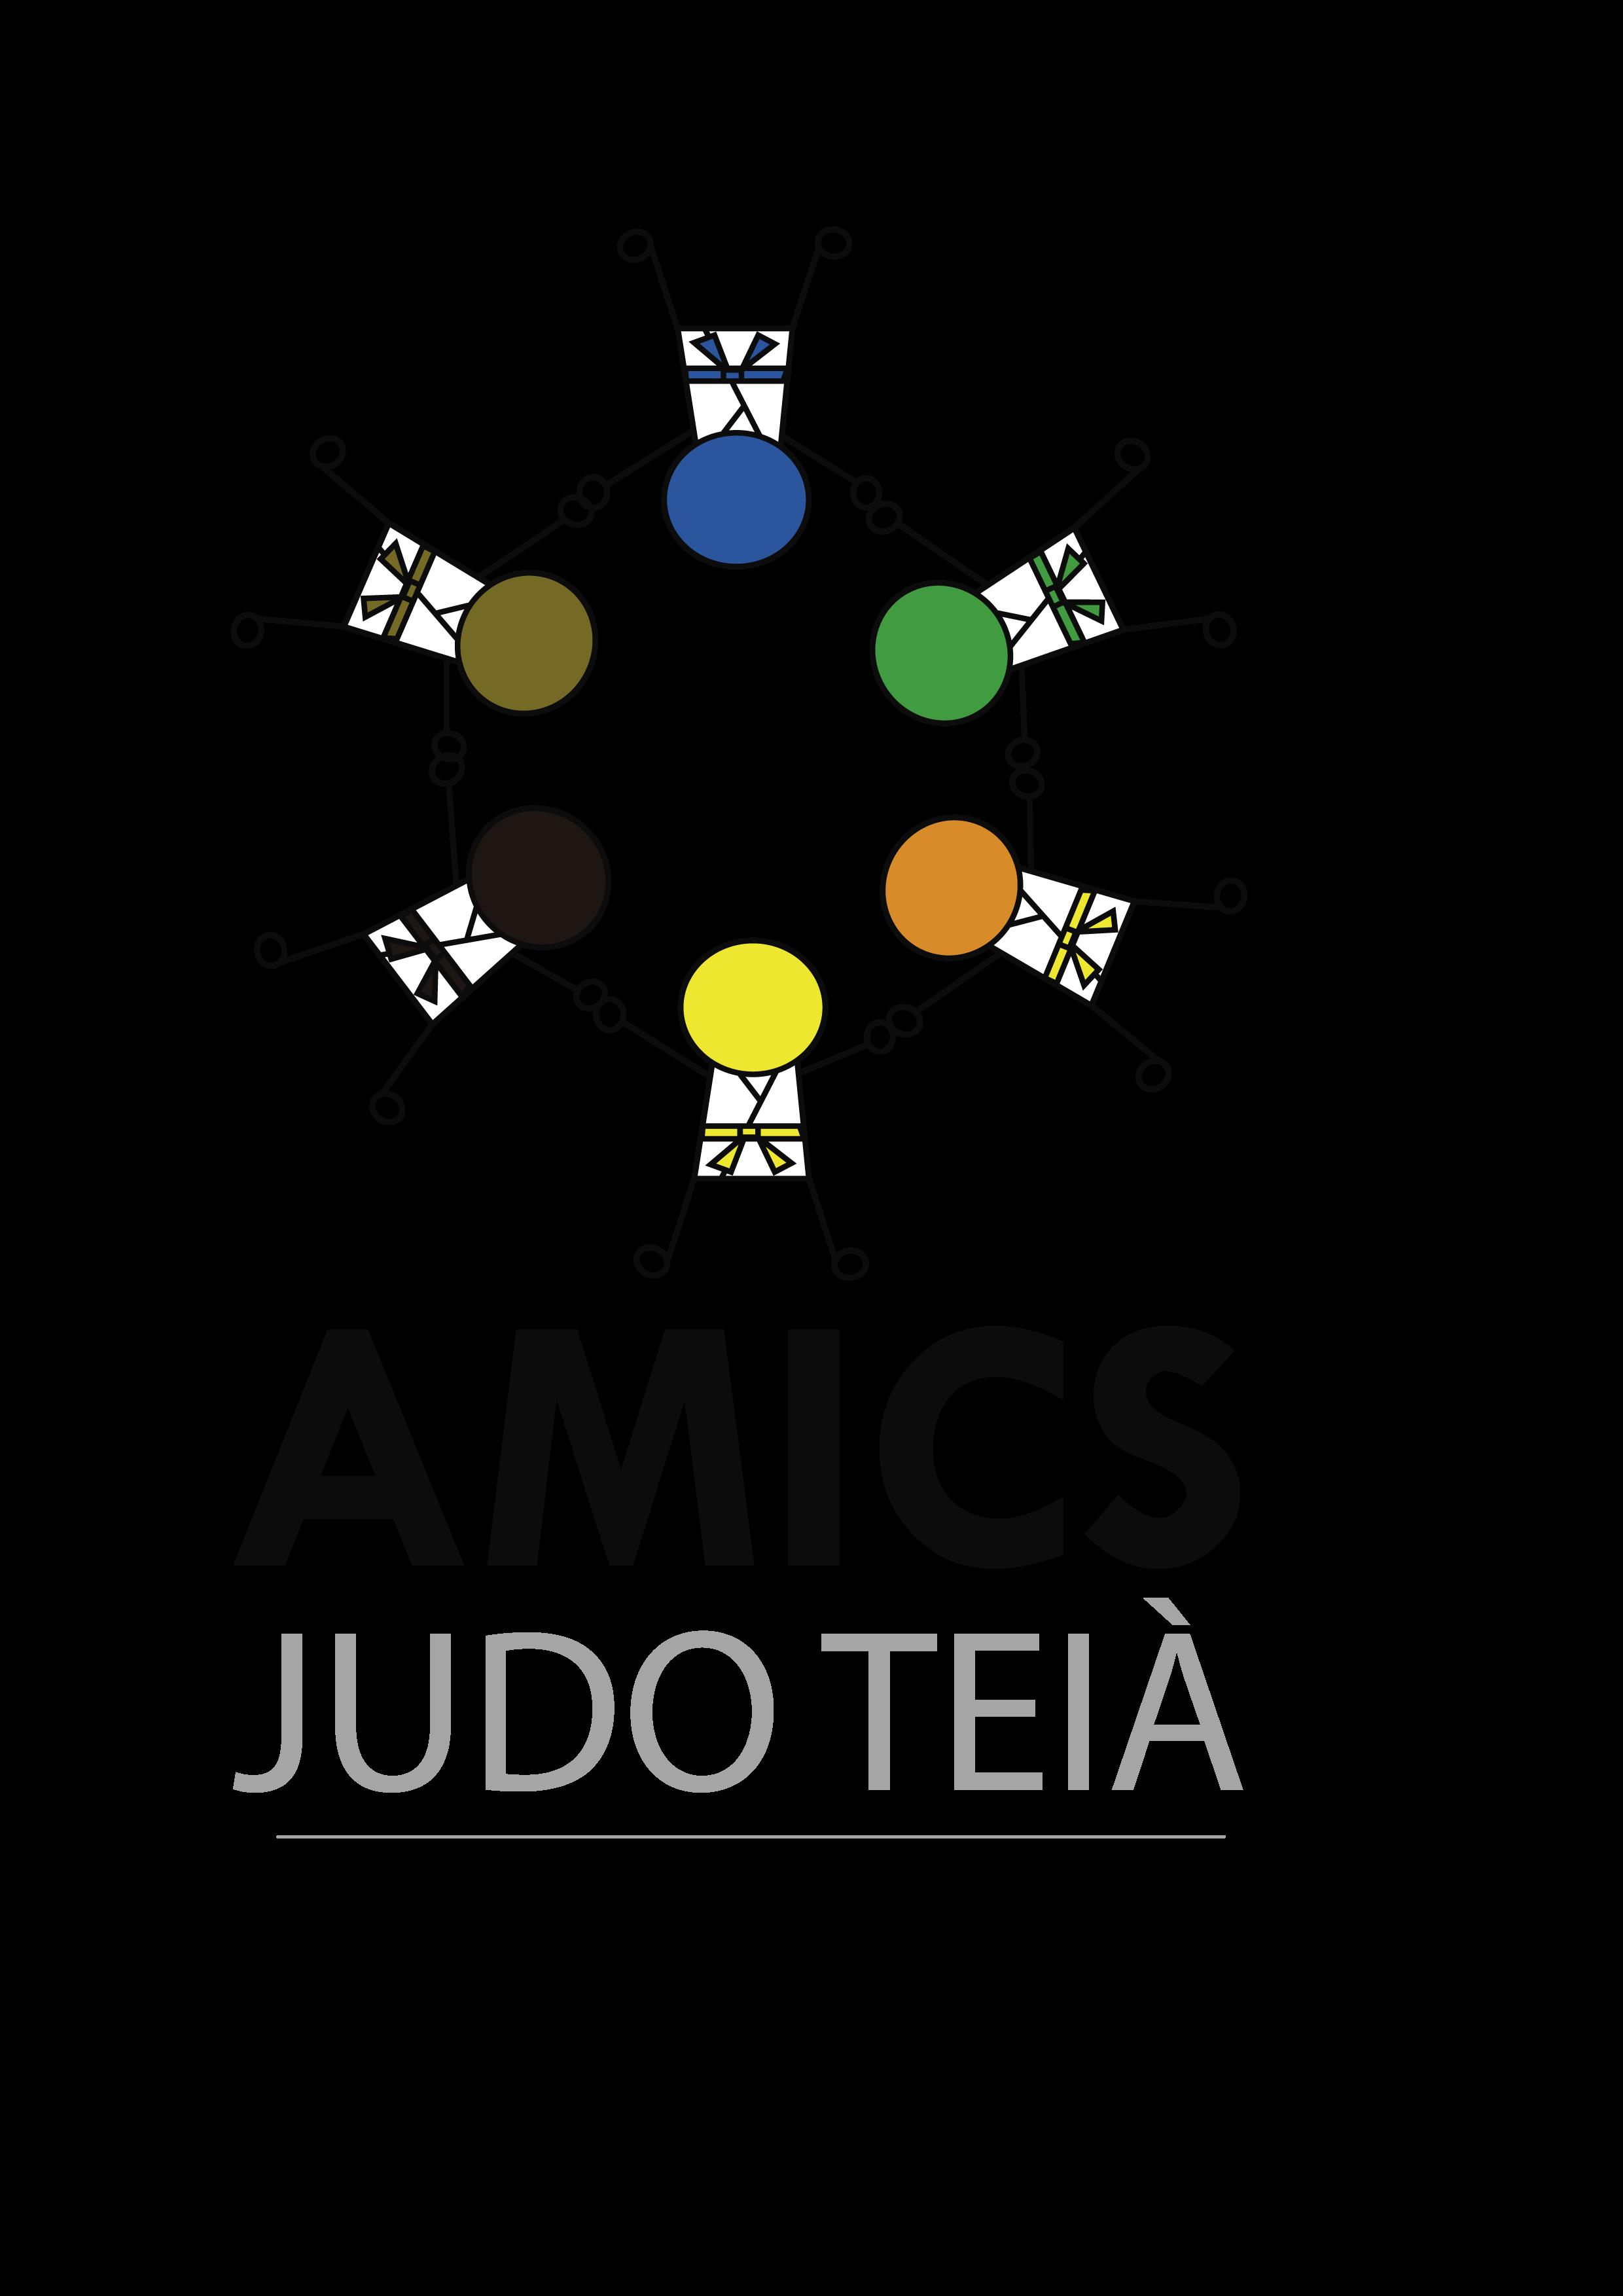 AMICSdeljudoTeia.png